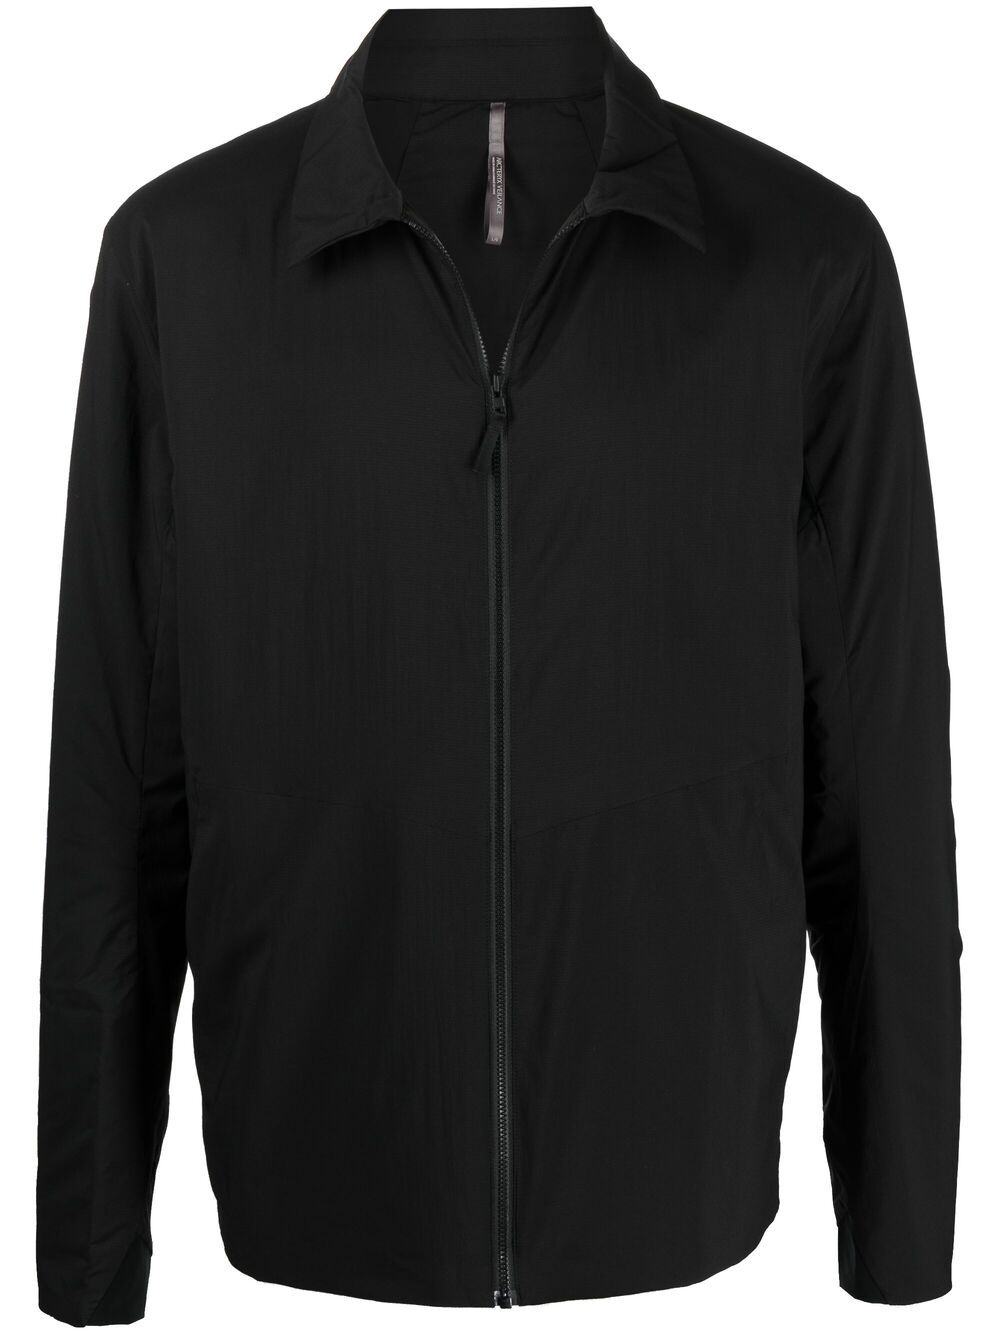 Giacca con zip nero uomo cotone VEILANCE | Giacche | 26957BLK